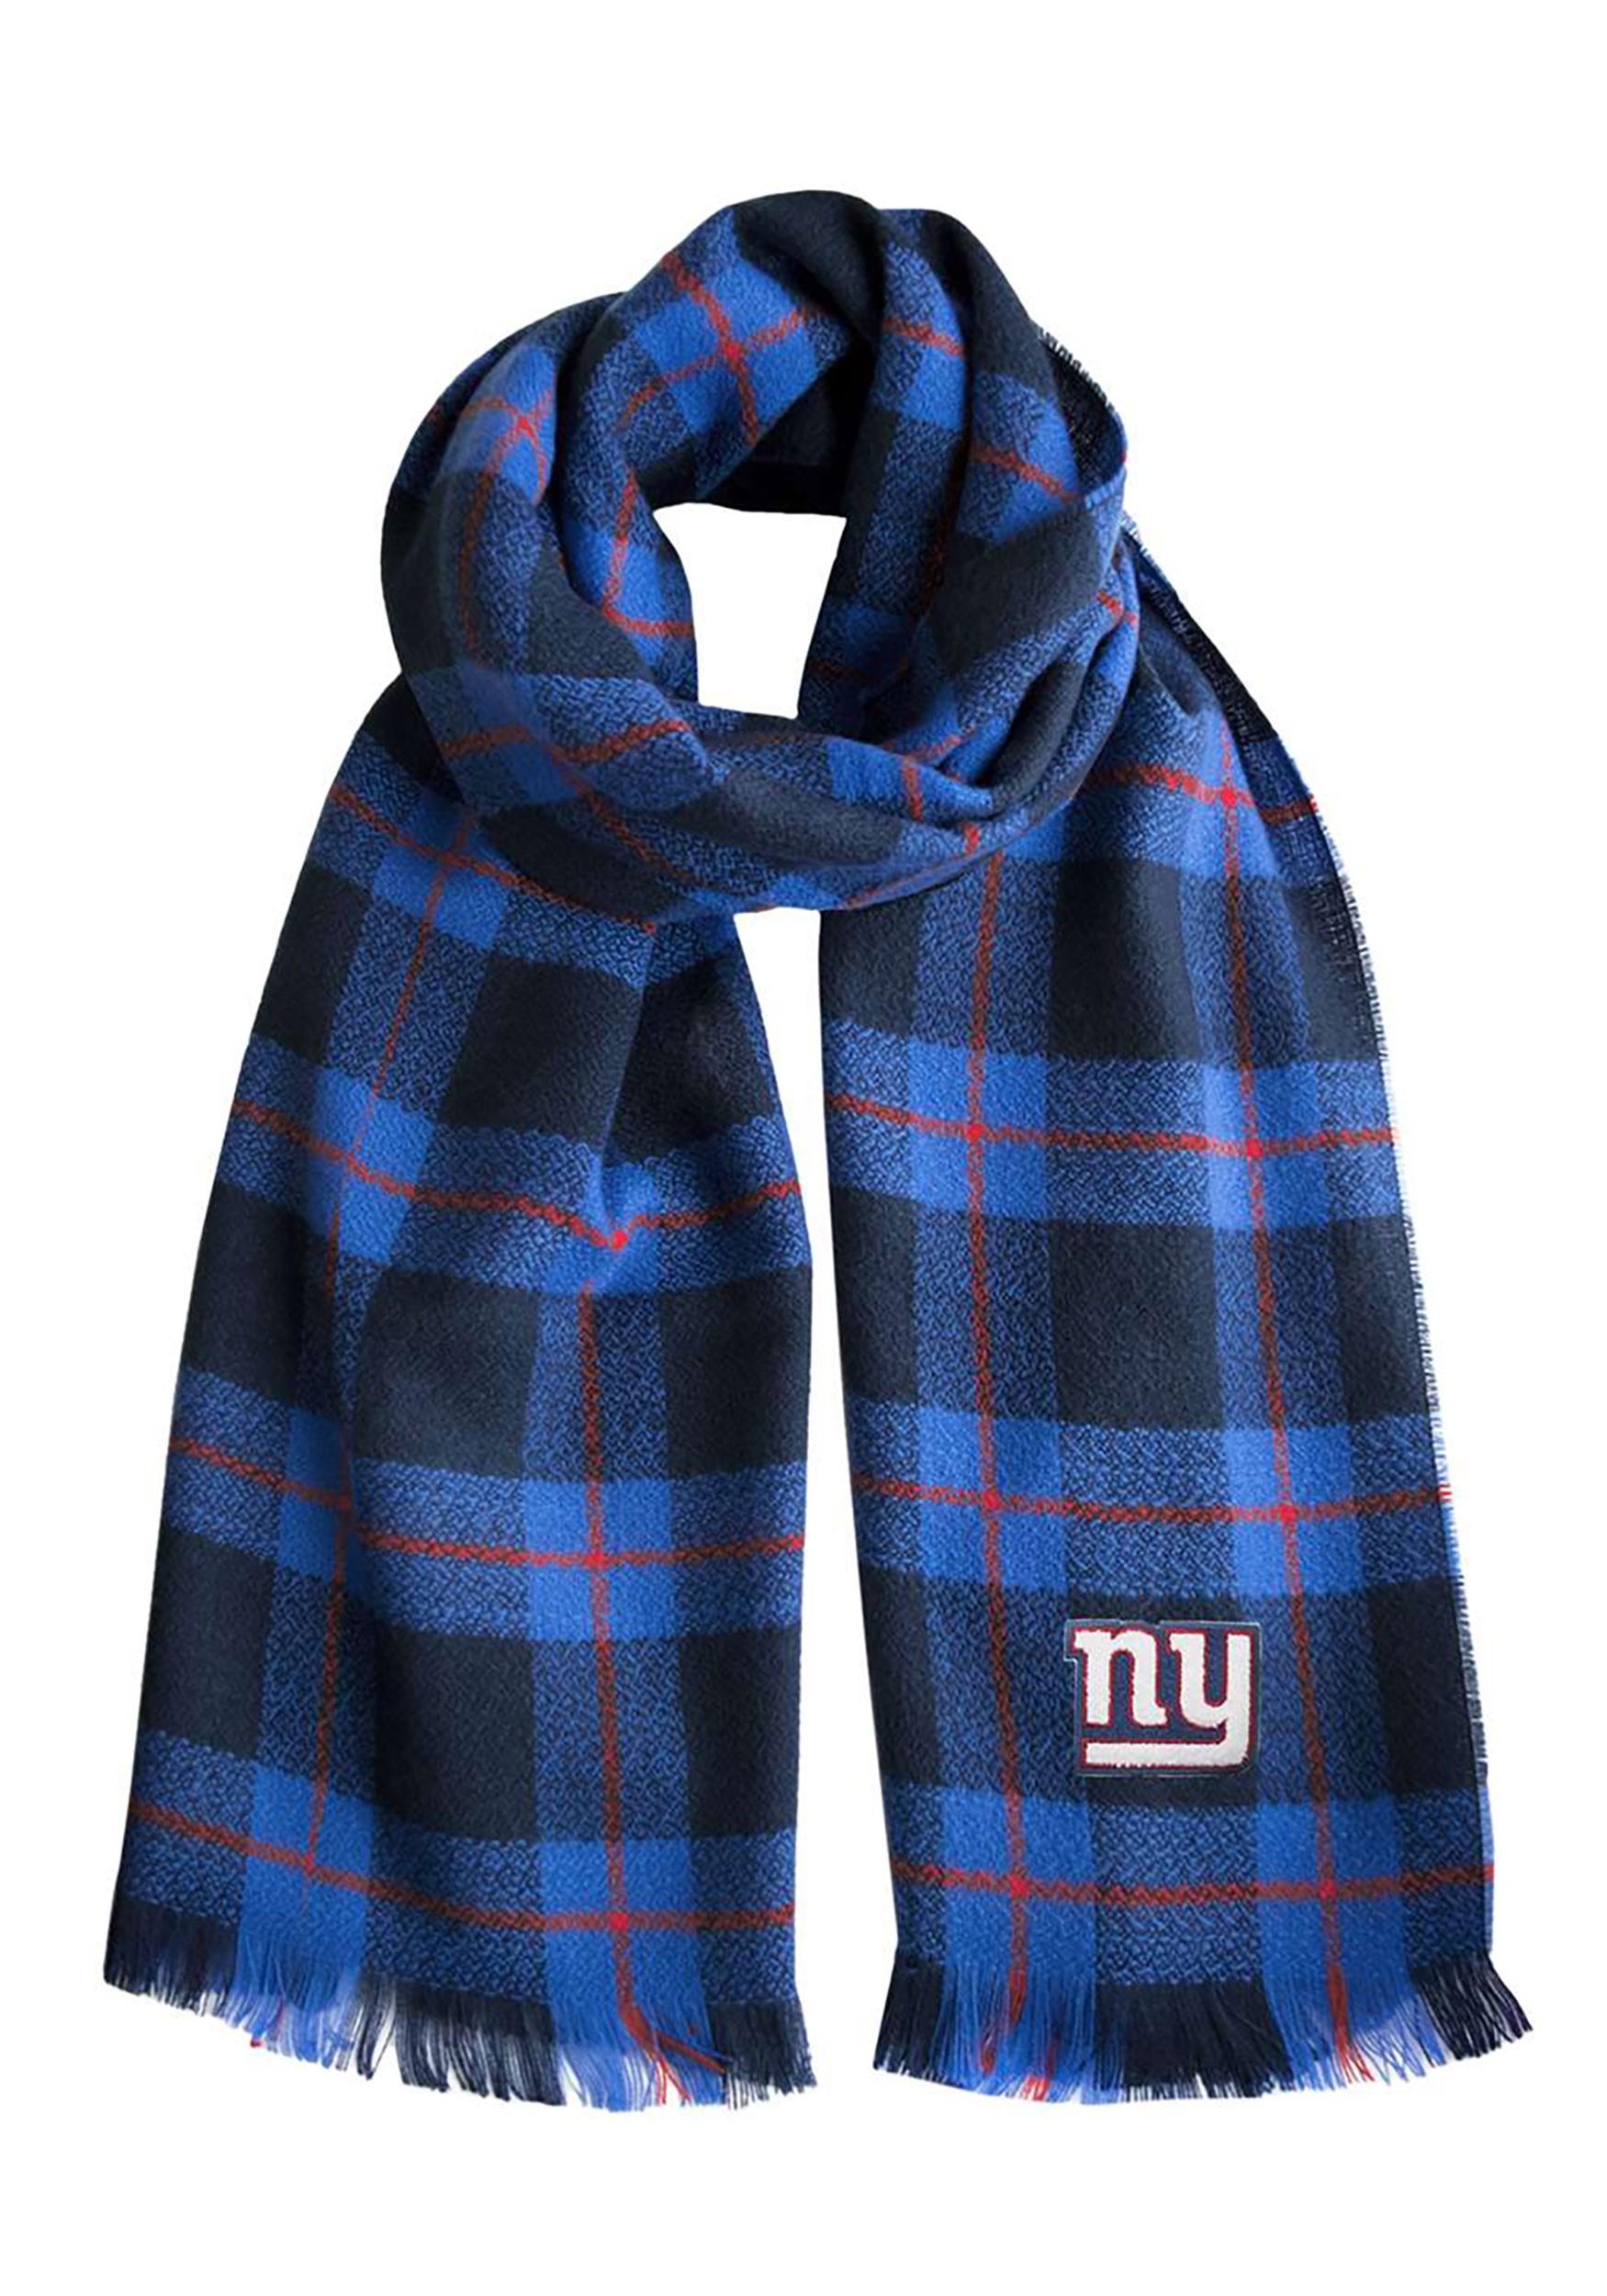 Comfy NFL New York Giants Plaid Blanket Scarf